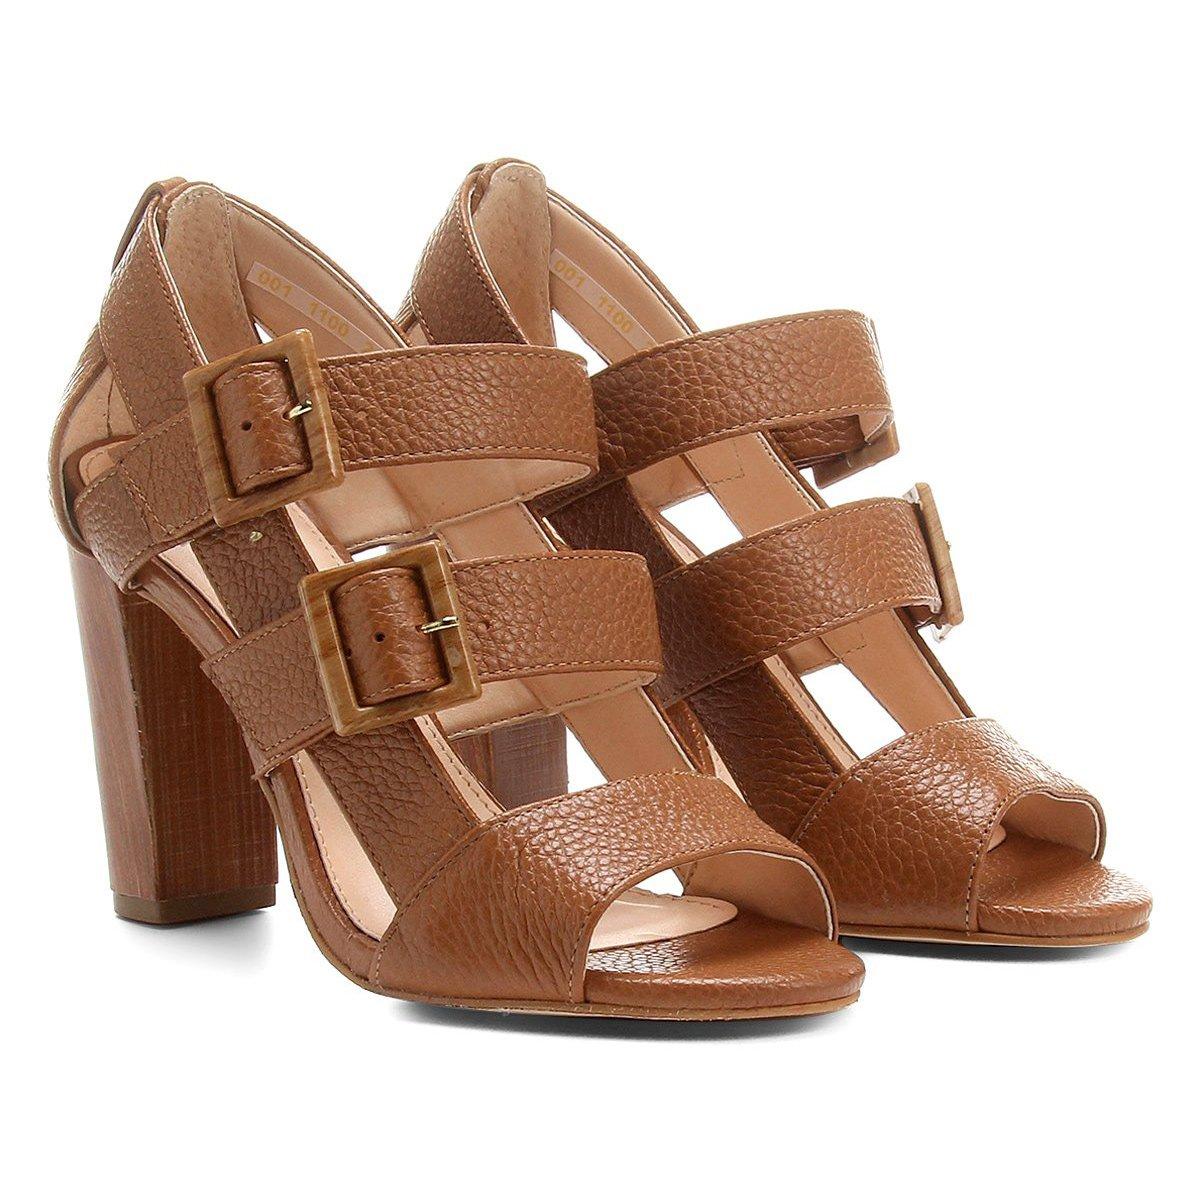 Grosso Salto Shoestock Couro Sandália Feminina Fivelas Ed2ehiw9y 1TFJlKc